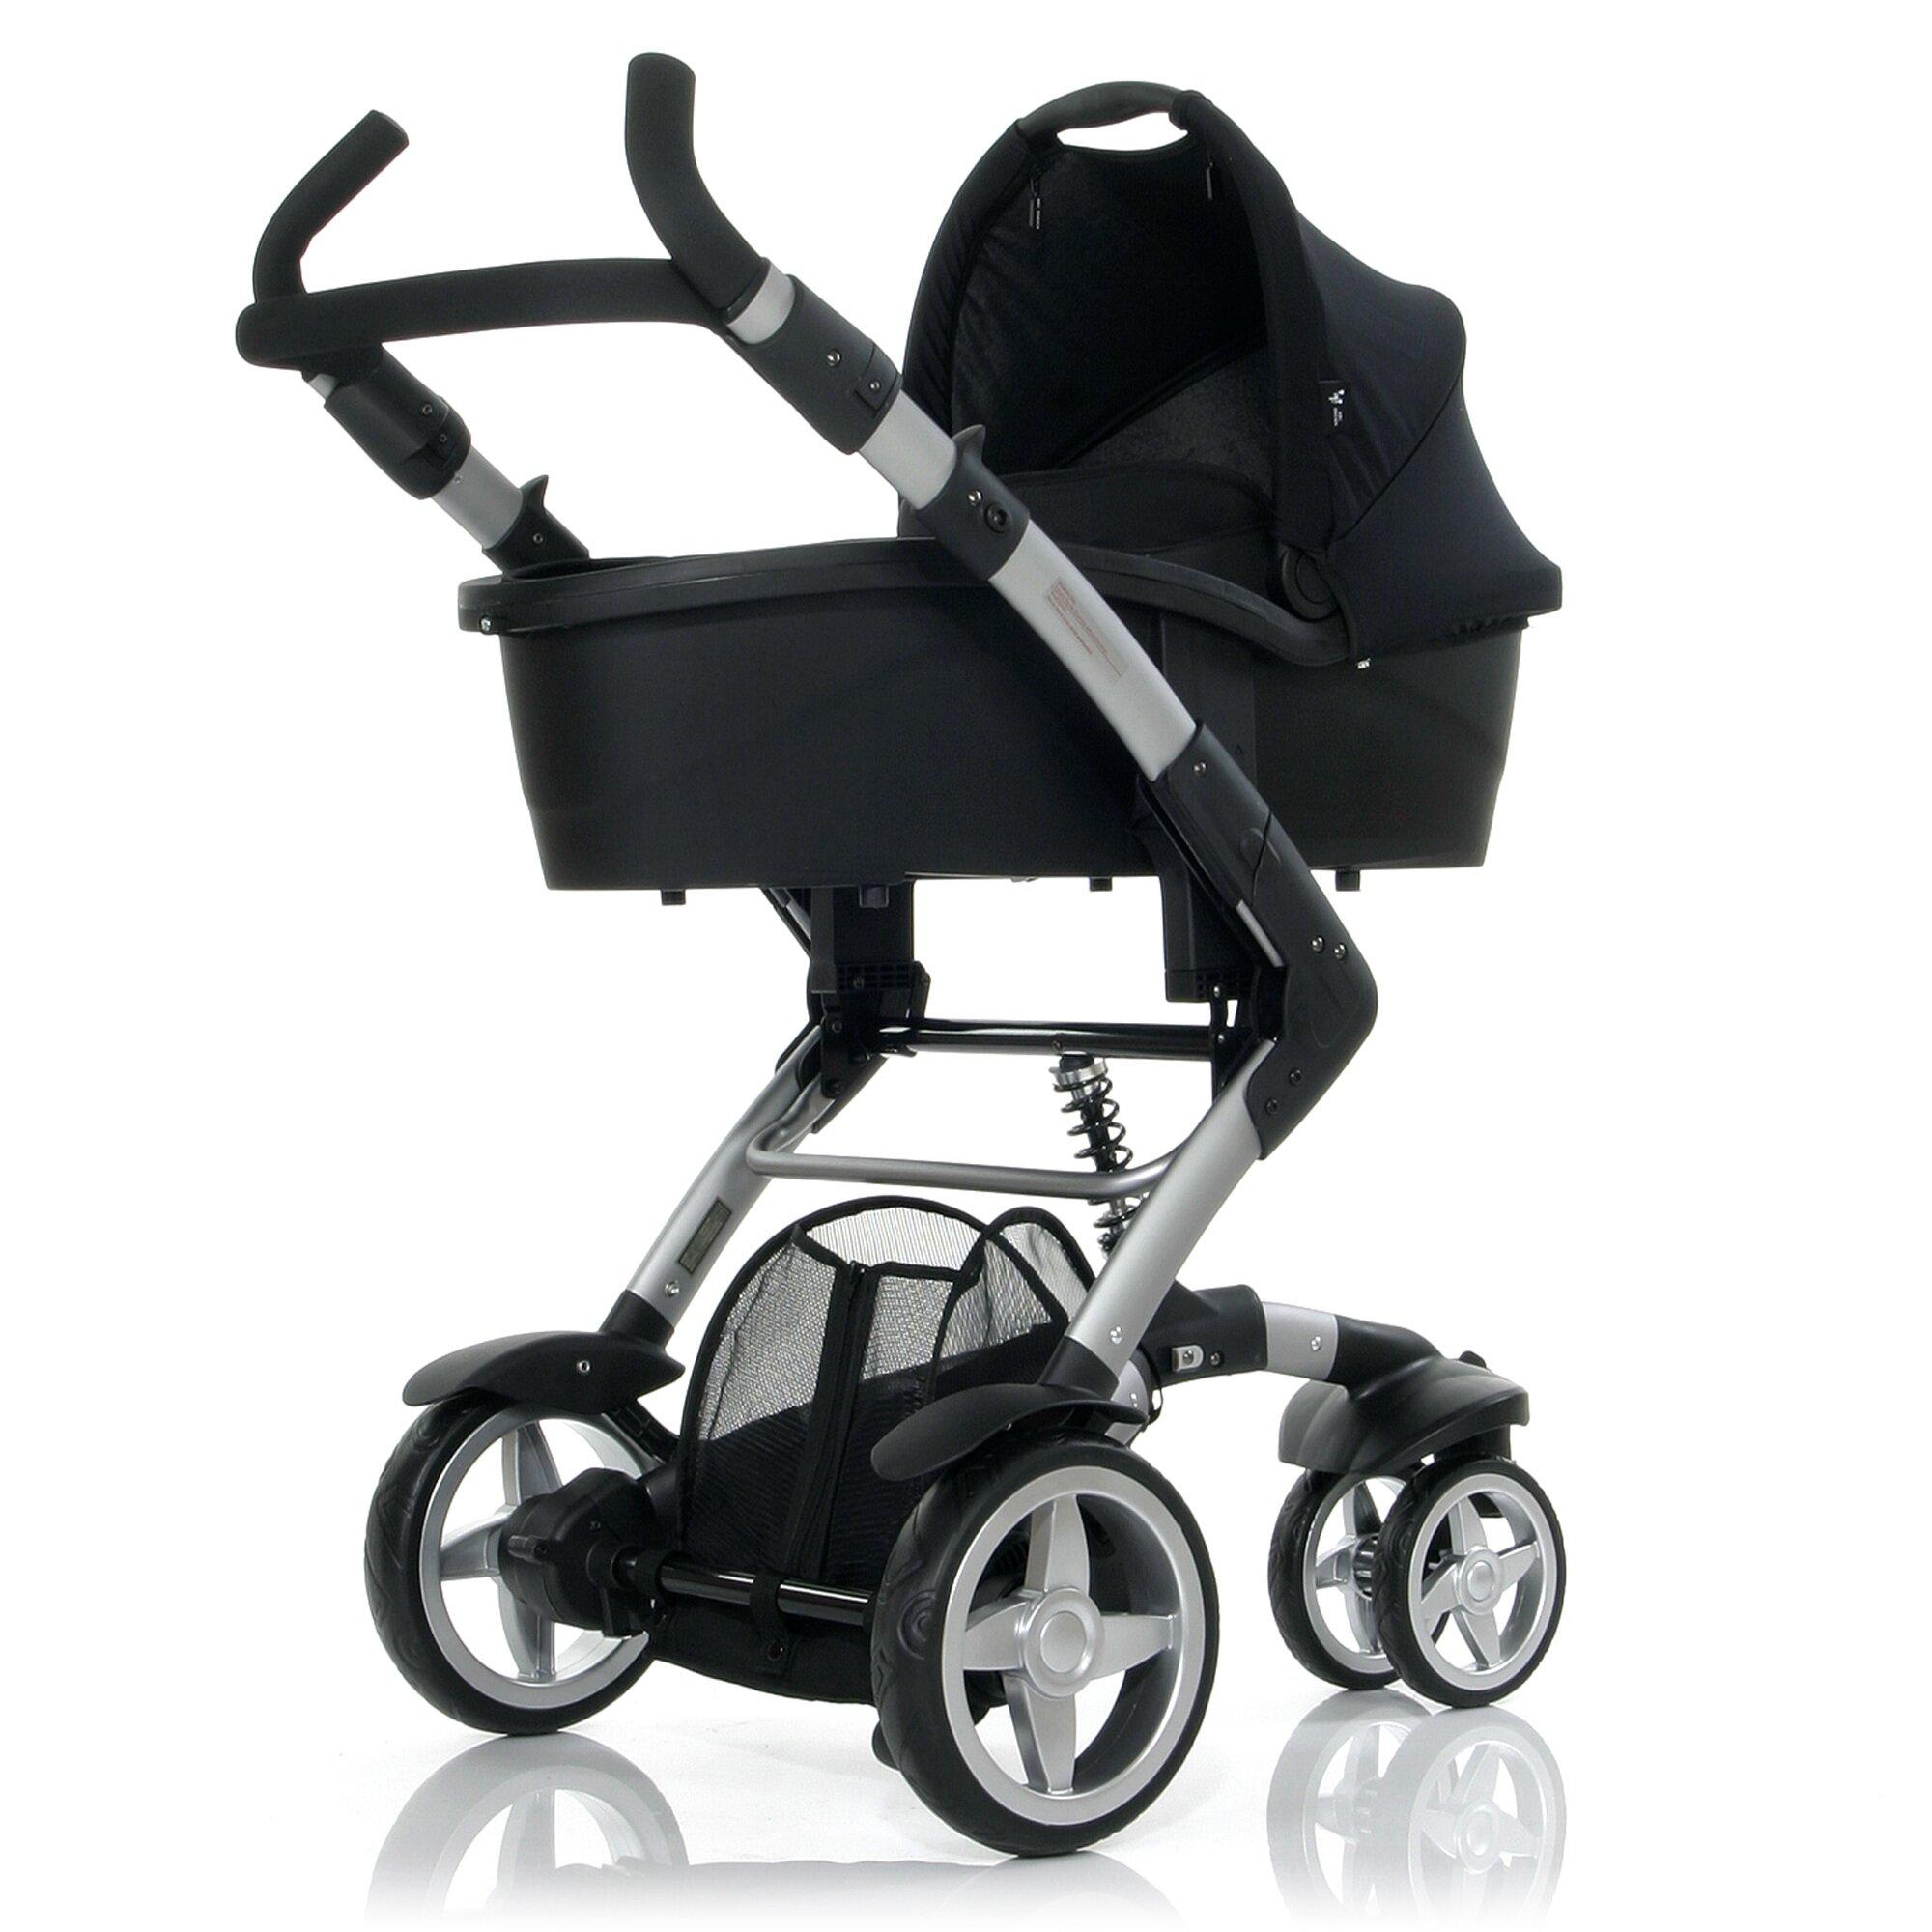 abc-design-risus-doozy-adapter-fur-kinderwagen-cobra-mamba-3tec-condor-4s-turbo-4s-turbo-s-4f-turbo-6s-viper-4s-zoom